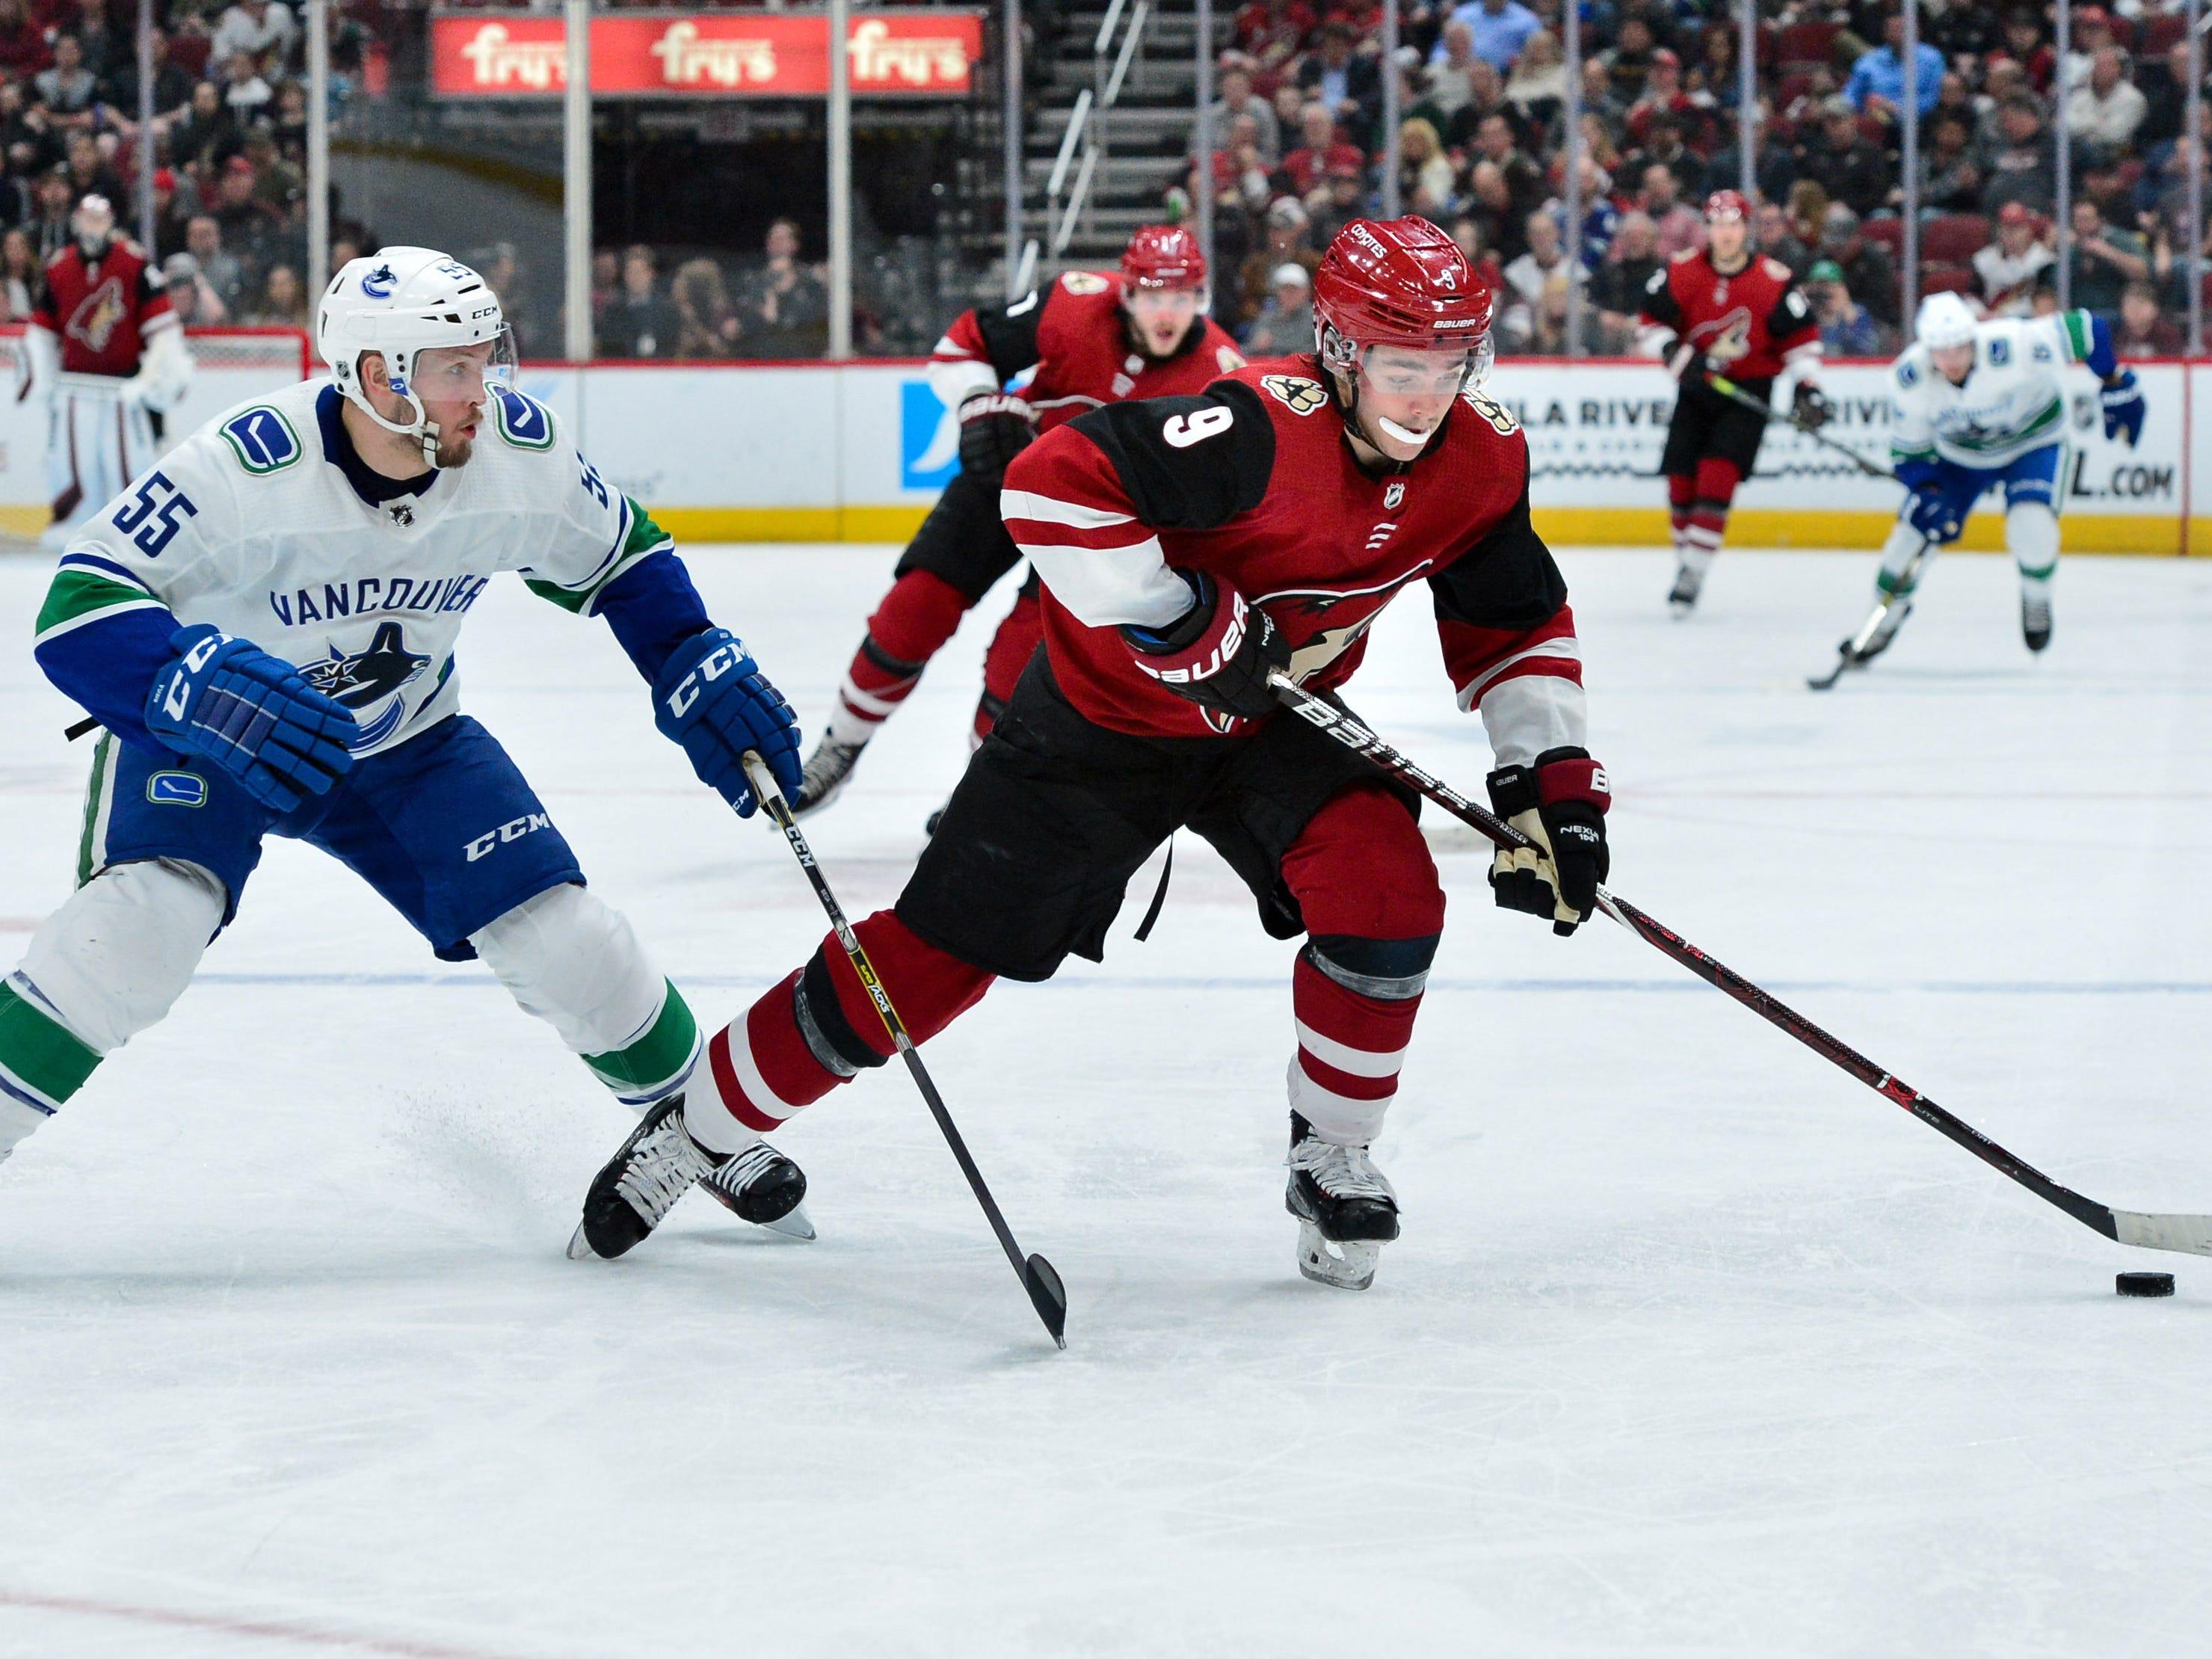 Feb 28, 2019; Glendale, AZ, USA; Arizona Coyotes center Clayton Keller (9) skates with the puck as Vancouver Canucks defenseman Alex Biega (55) defends during the second period at Gila River Arena.